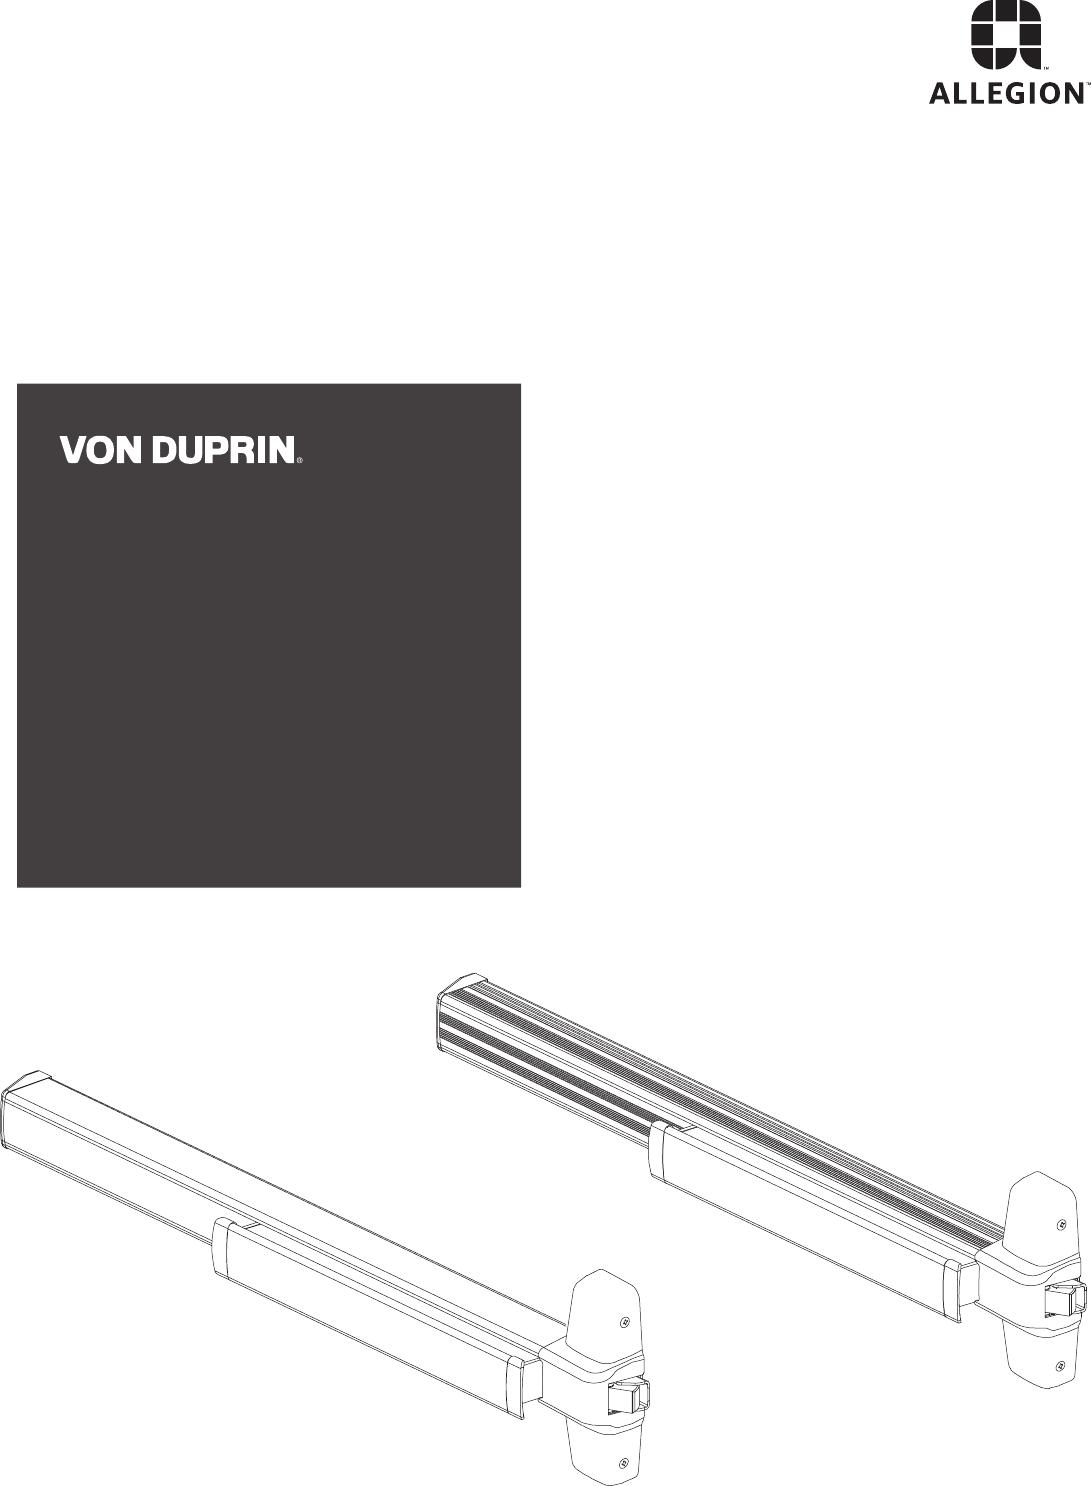 von duprin parts manual wiring diagram